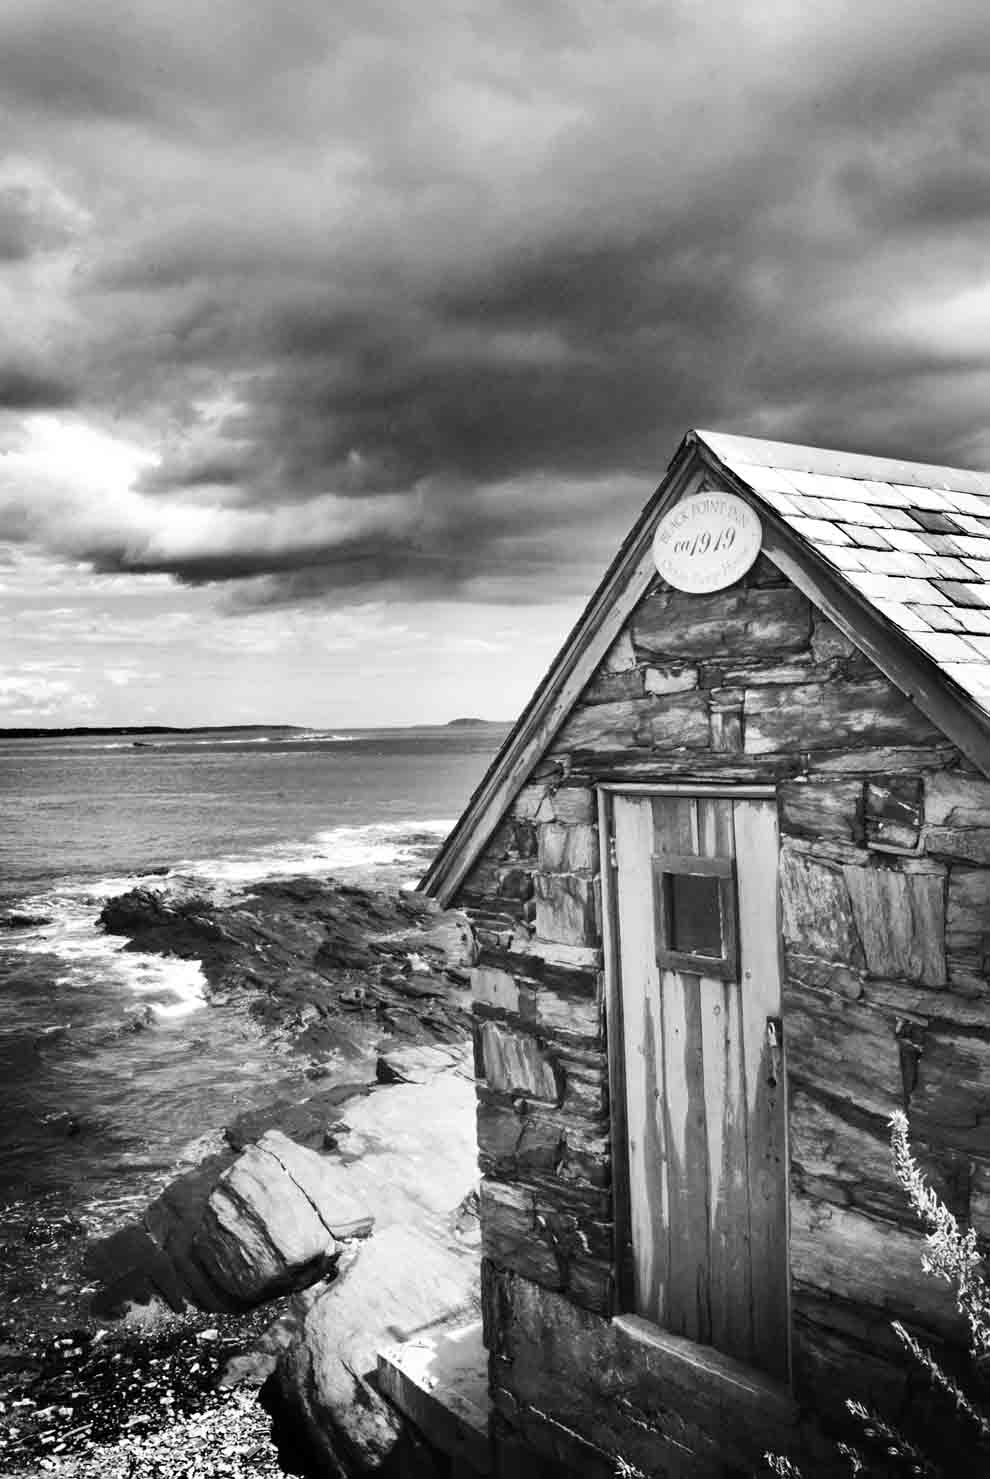 PhotoFly Travel Club | Maine Photography | PhotoFly Travel Club